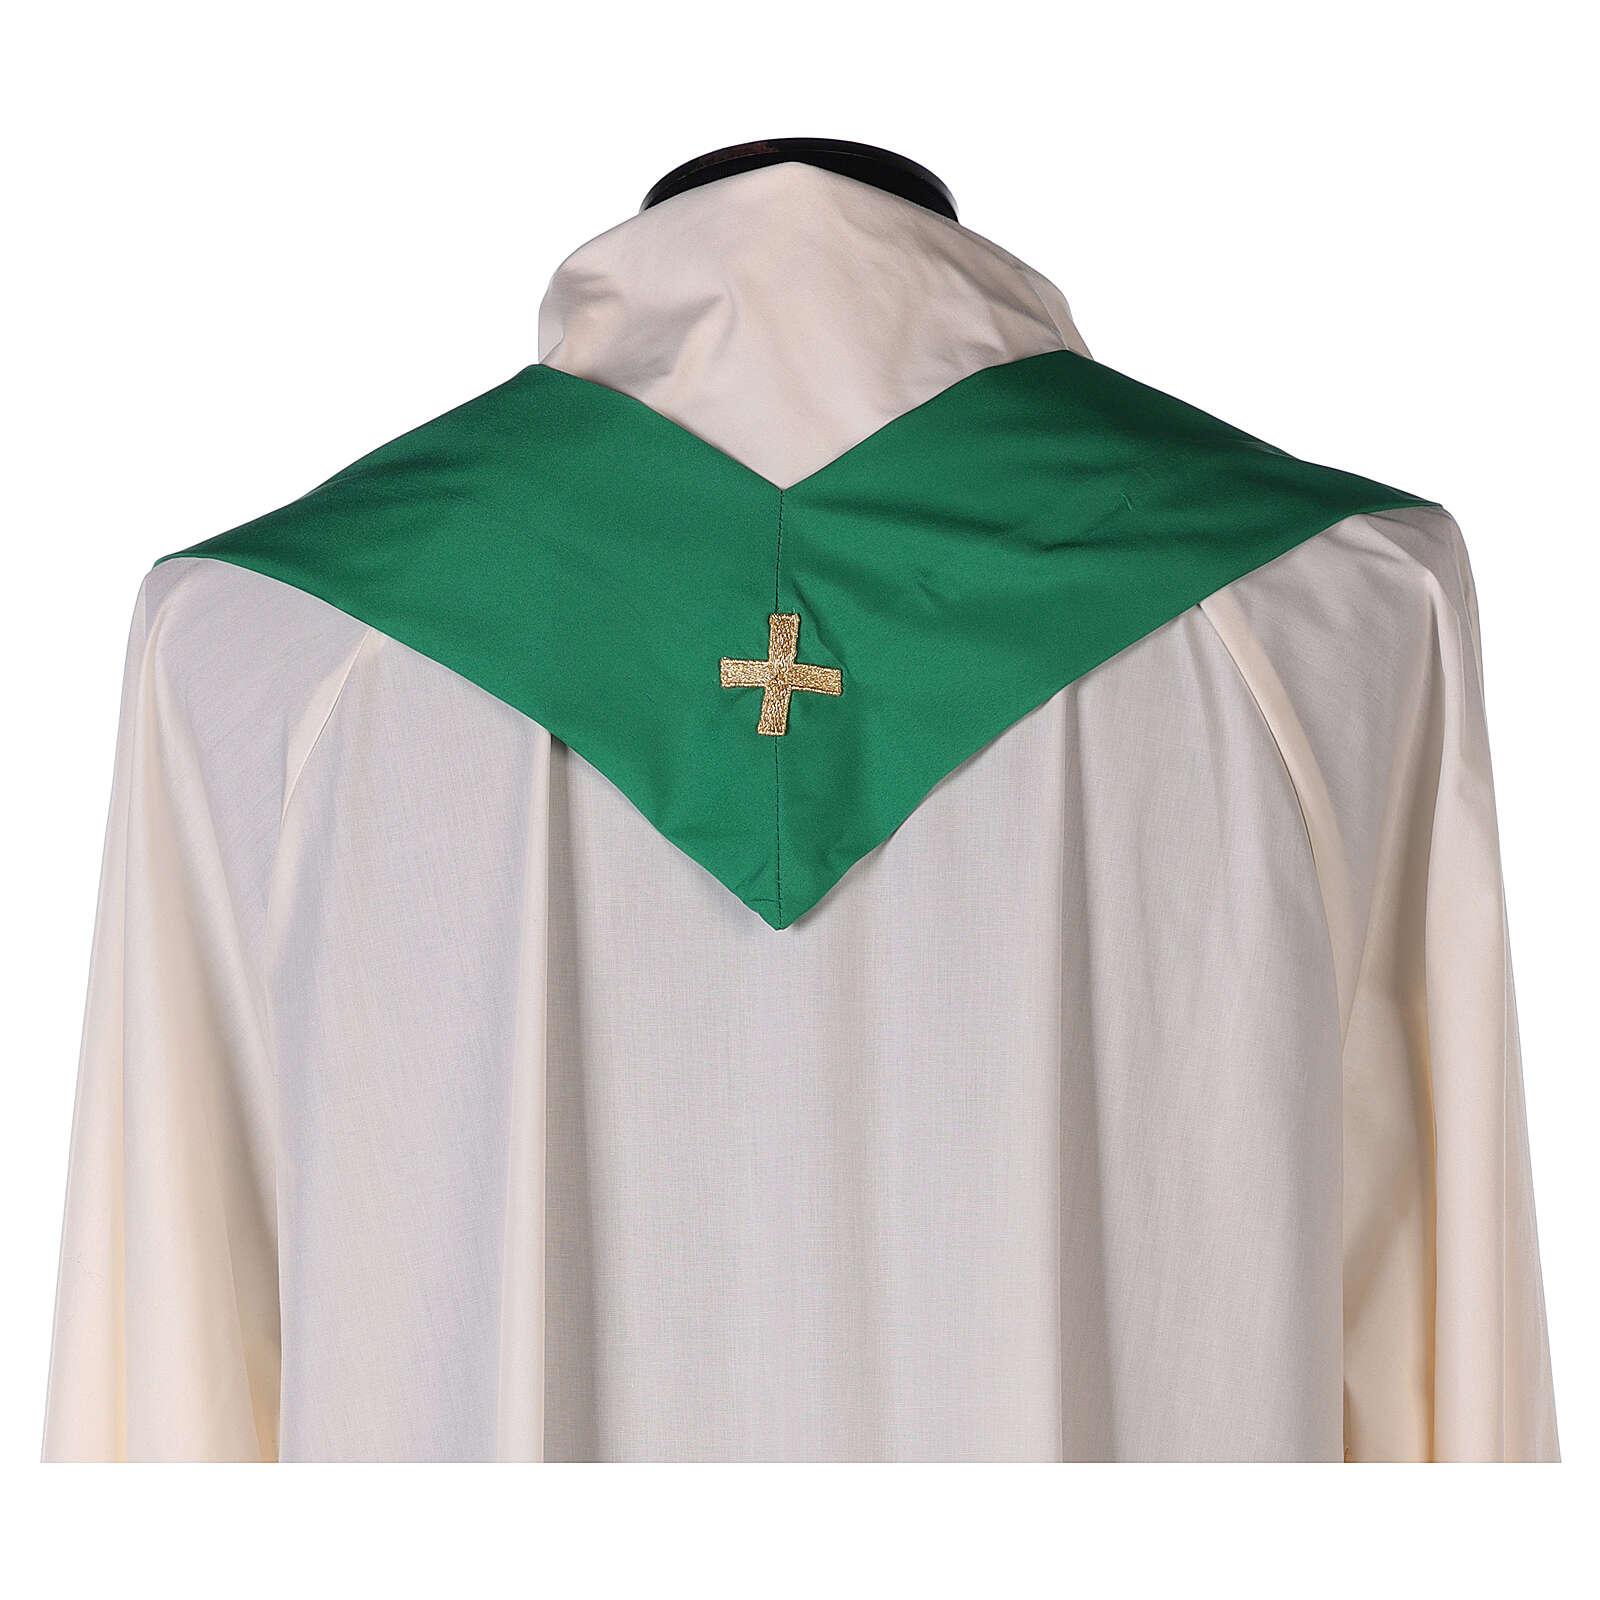 Casulla poliéster bordado cruz decorada OFERTA 4